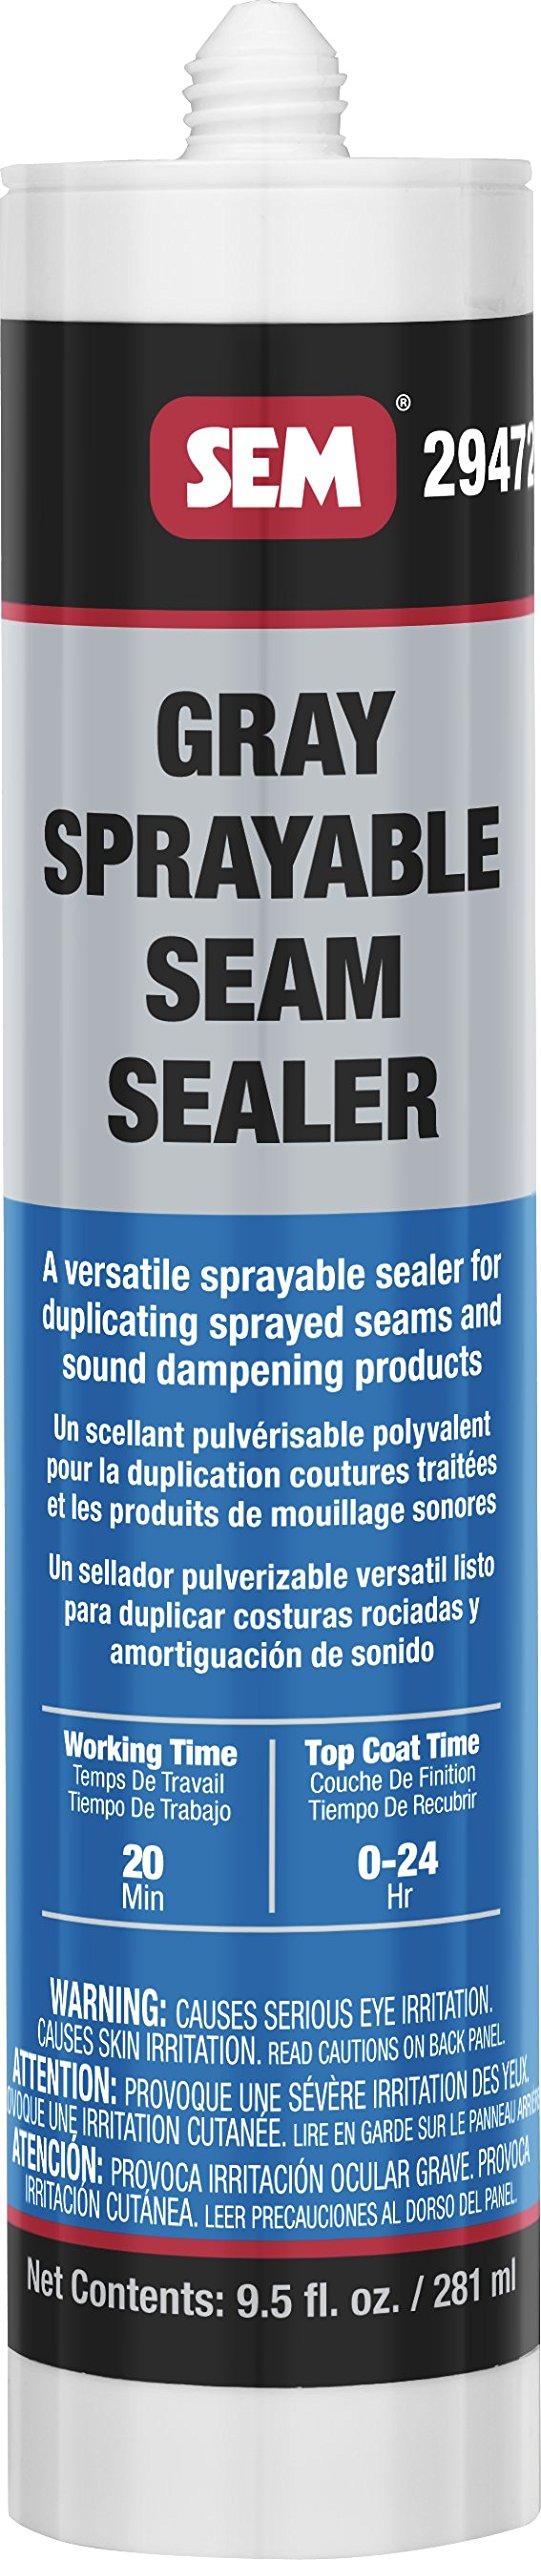 SEM 29472 Gray Seam Sealer, 9.5 Fluid_Ounces